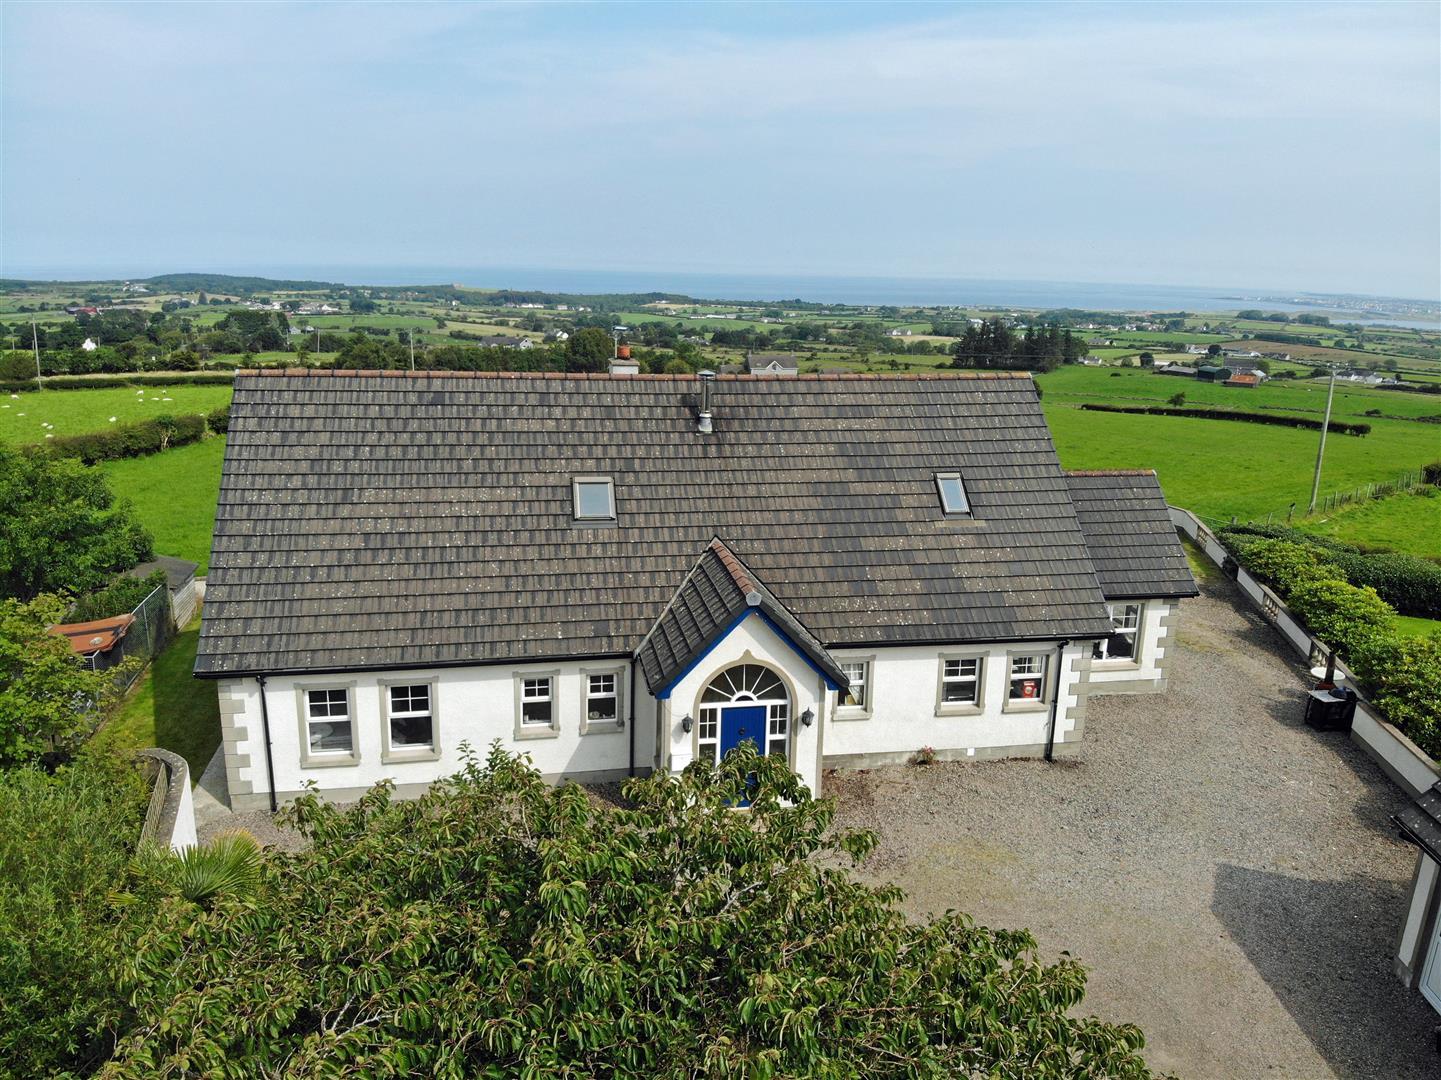 countryside unique duplex bungalow house with coastal views